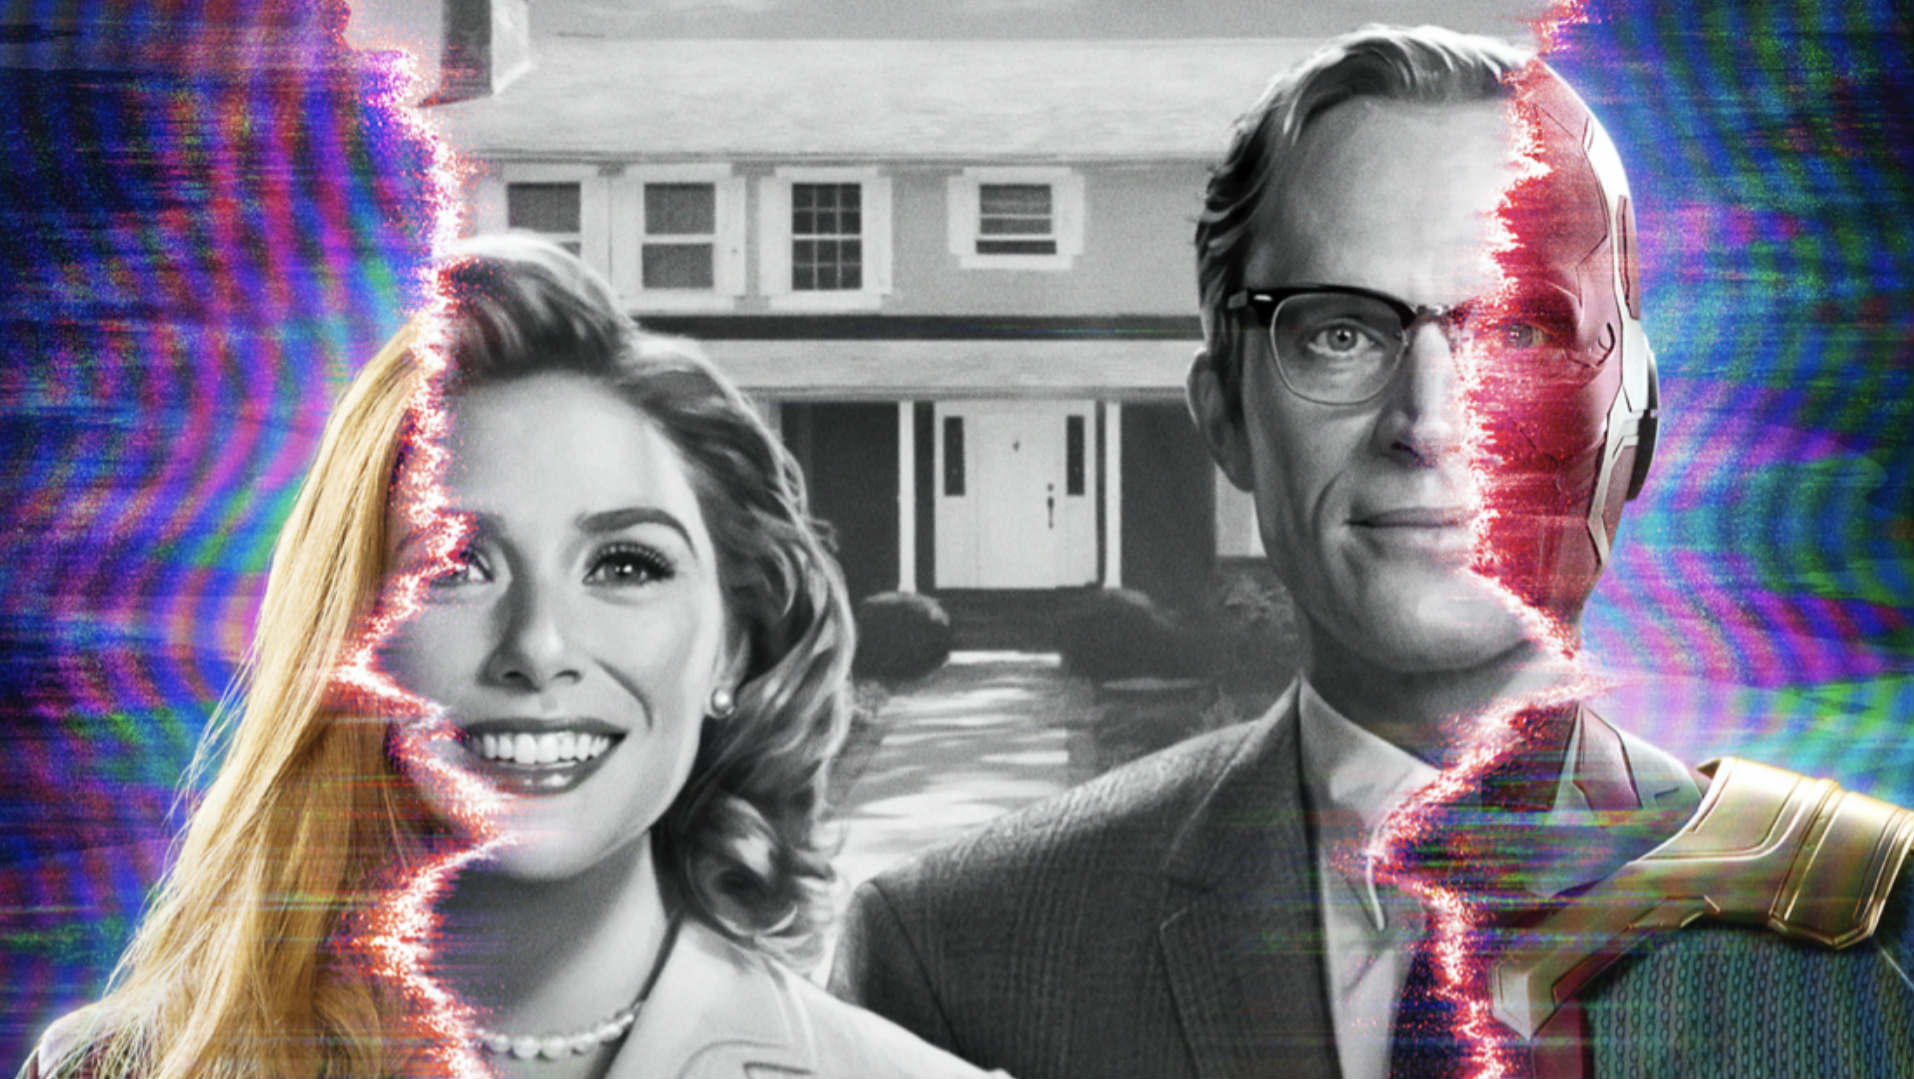 WandaVision Trailer: The MCU Finally Let its Freak Flag Fly